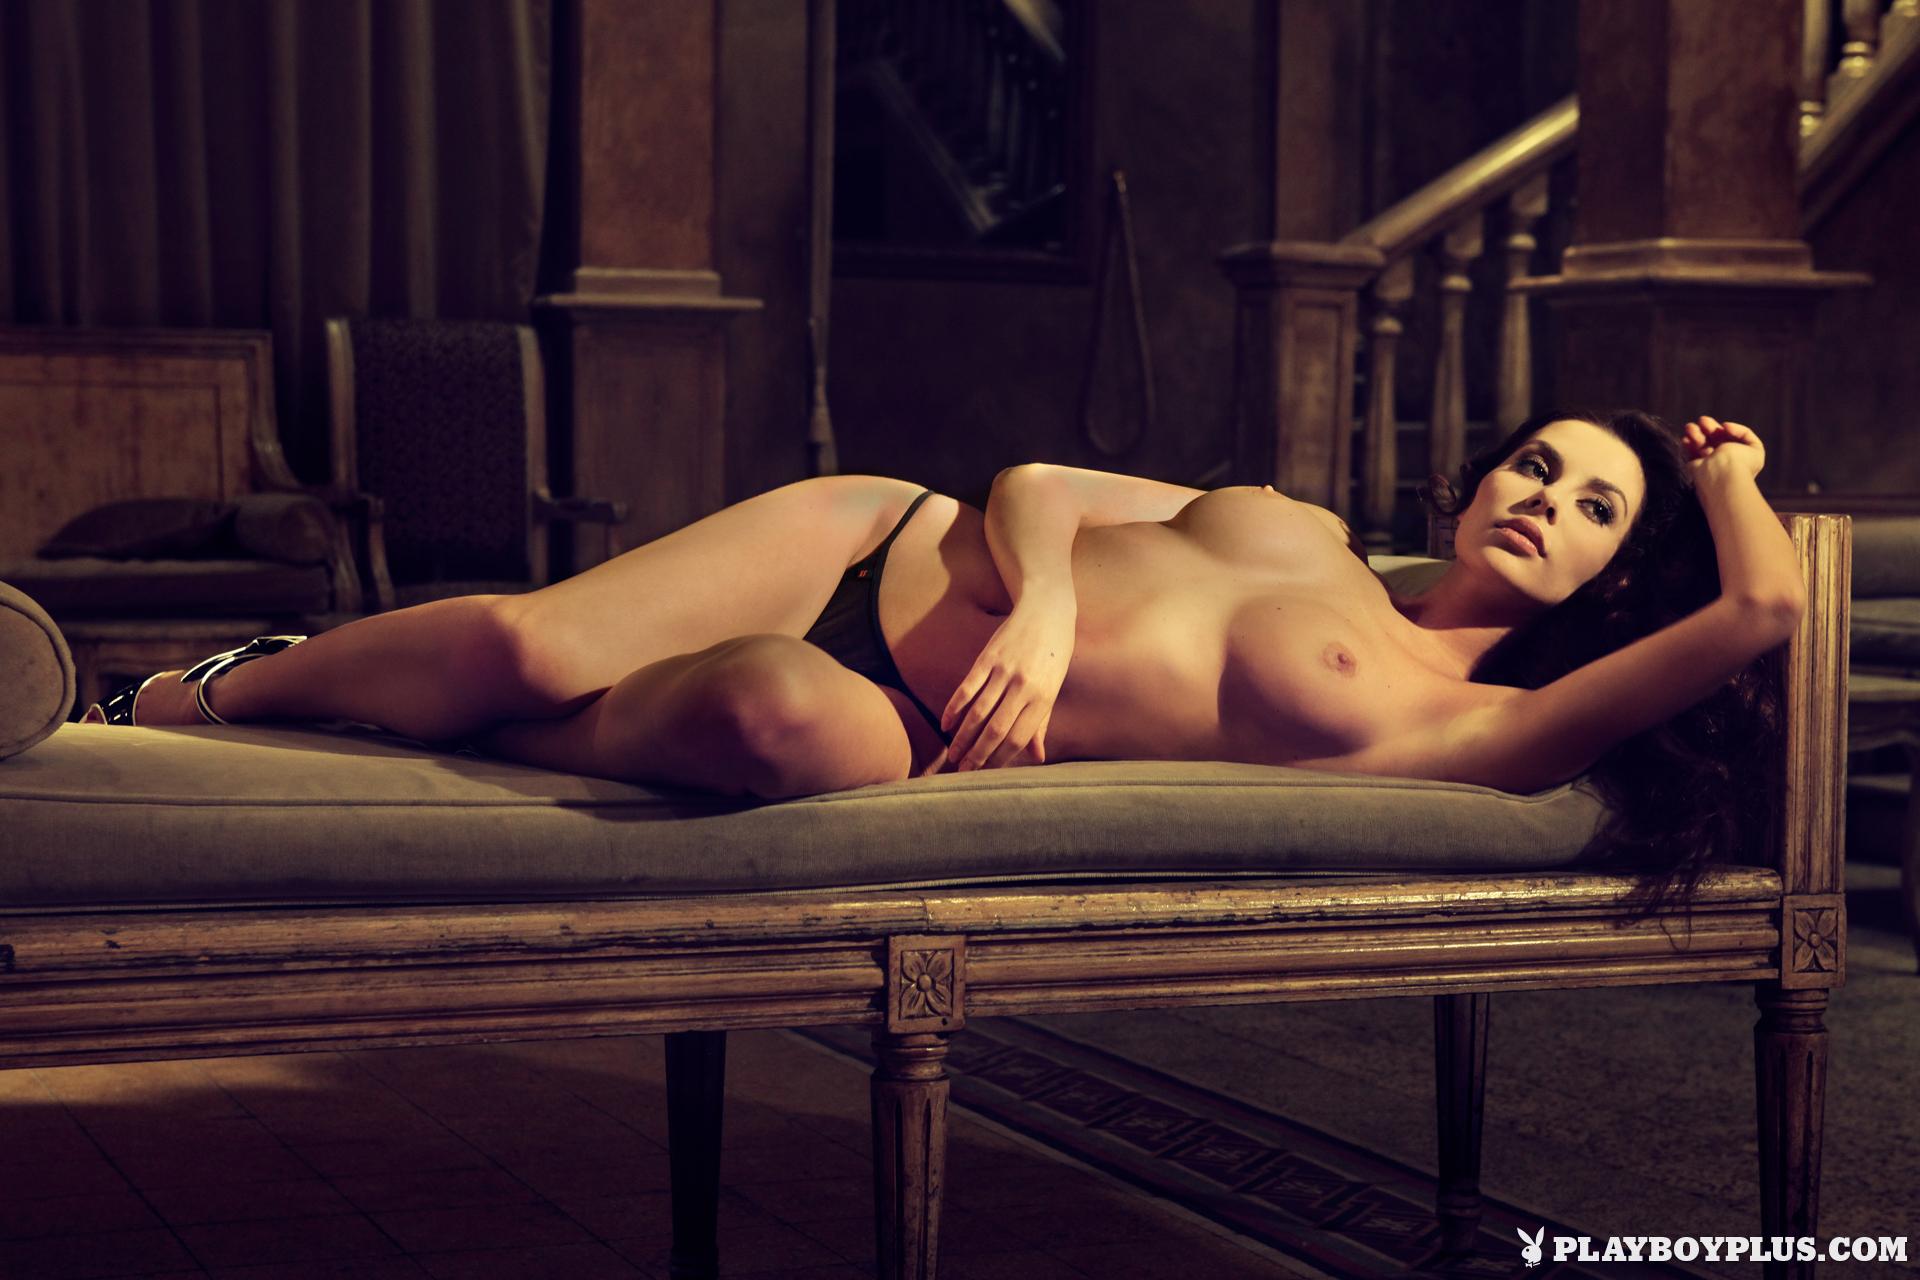 Nude maria kanellis wwe diva playboy photos frontal nudity